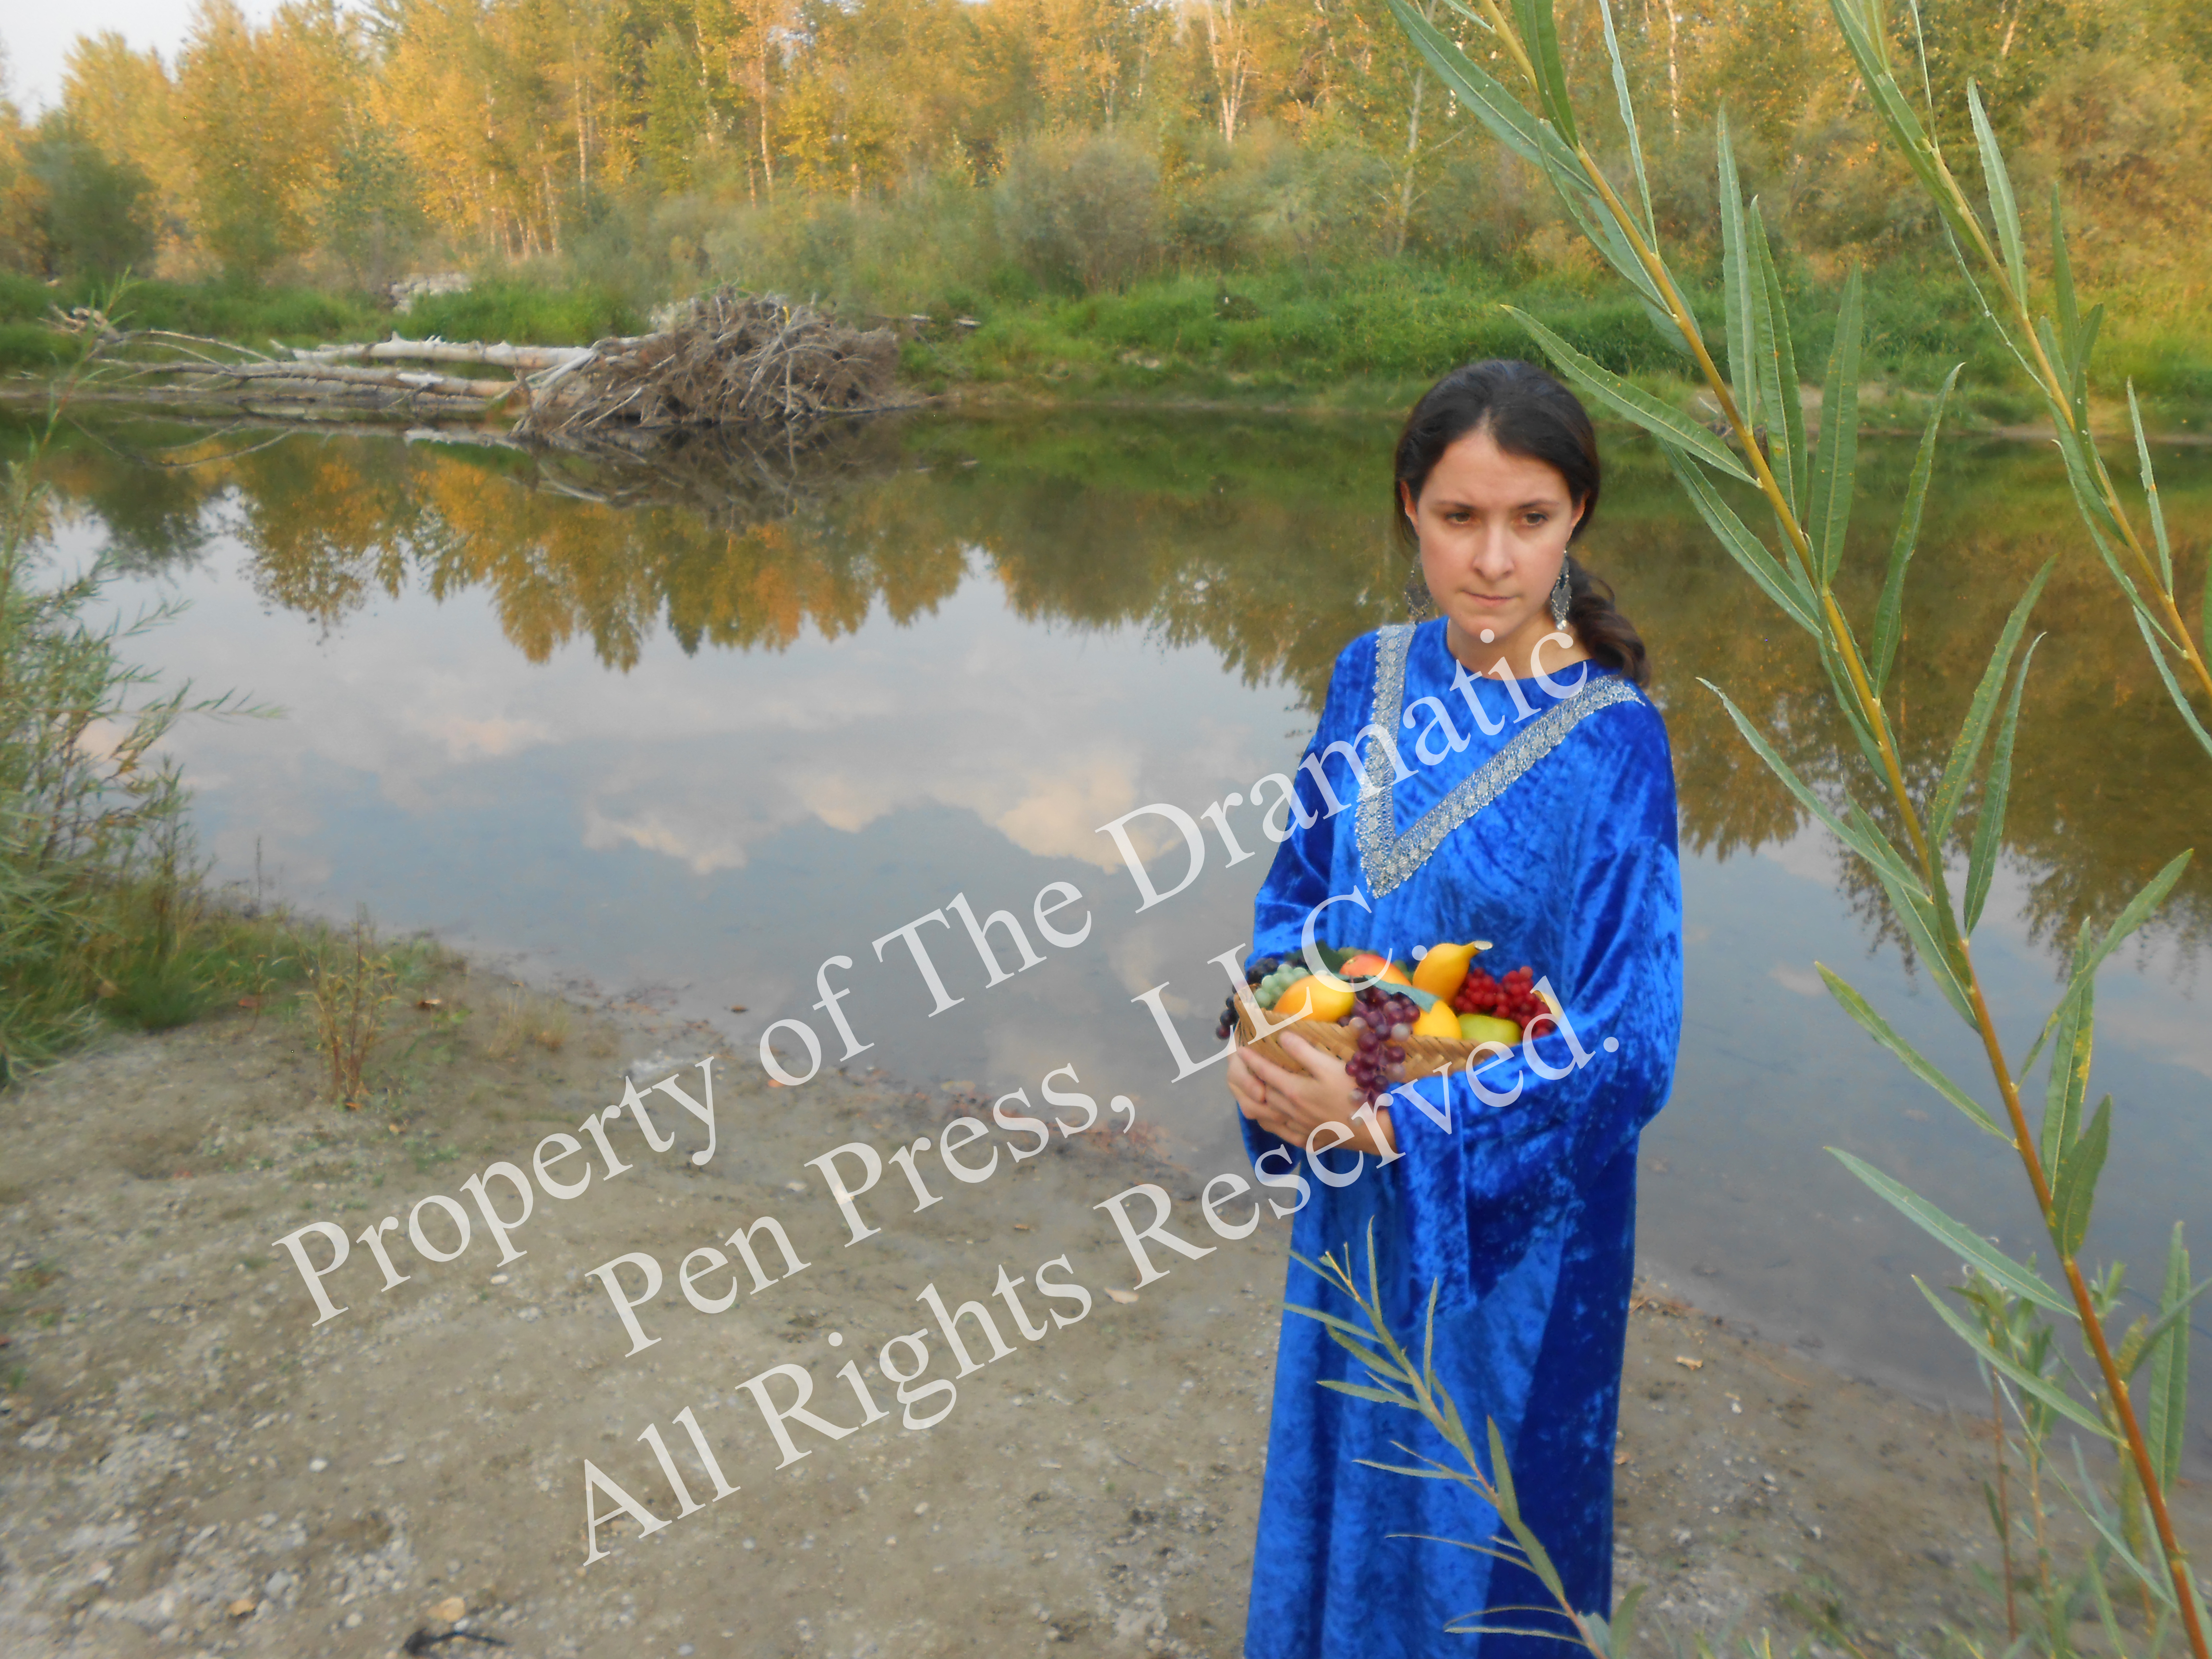 Biblical Woman River Reeds w Fruit